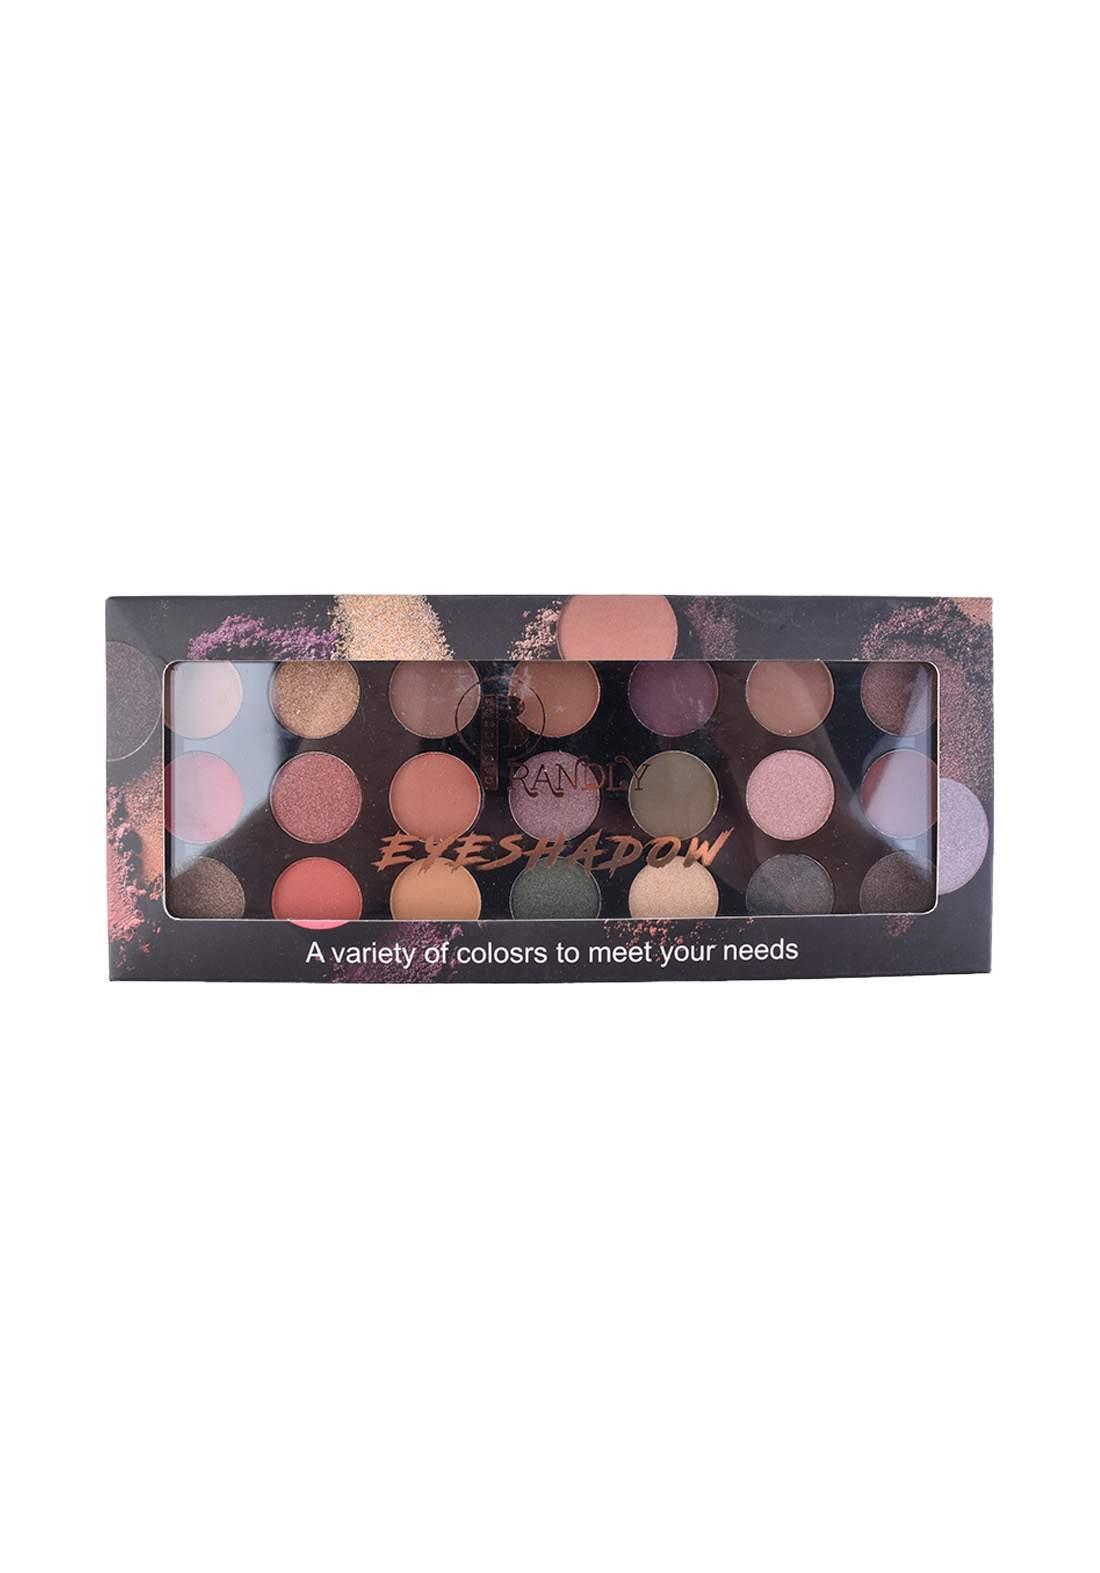 Brandly Cosmetics Eyeshadow Palette No.2 ظلال عيون